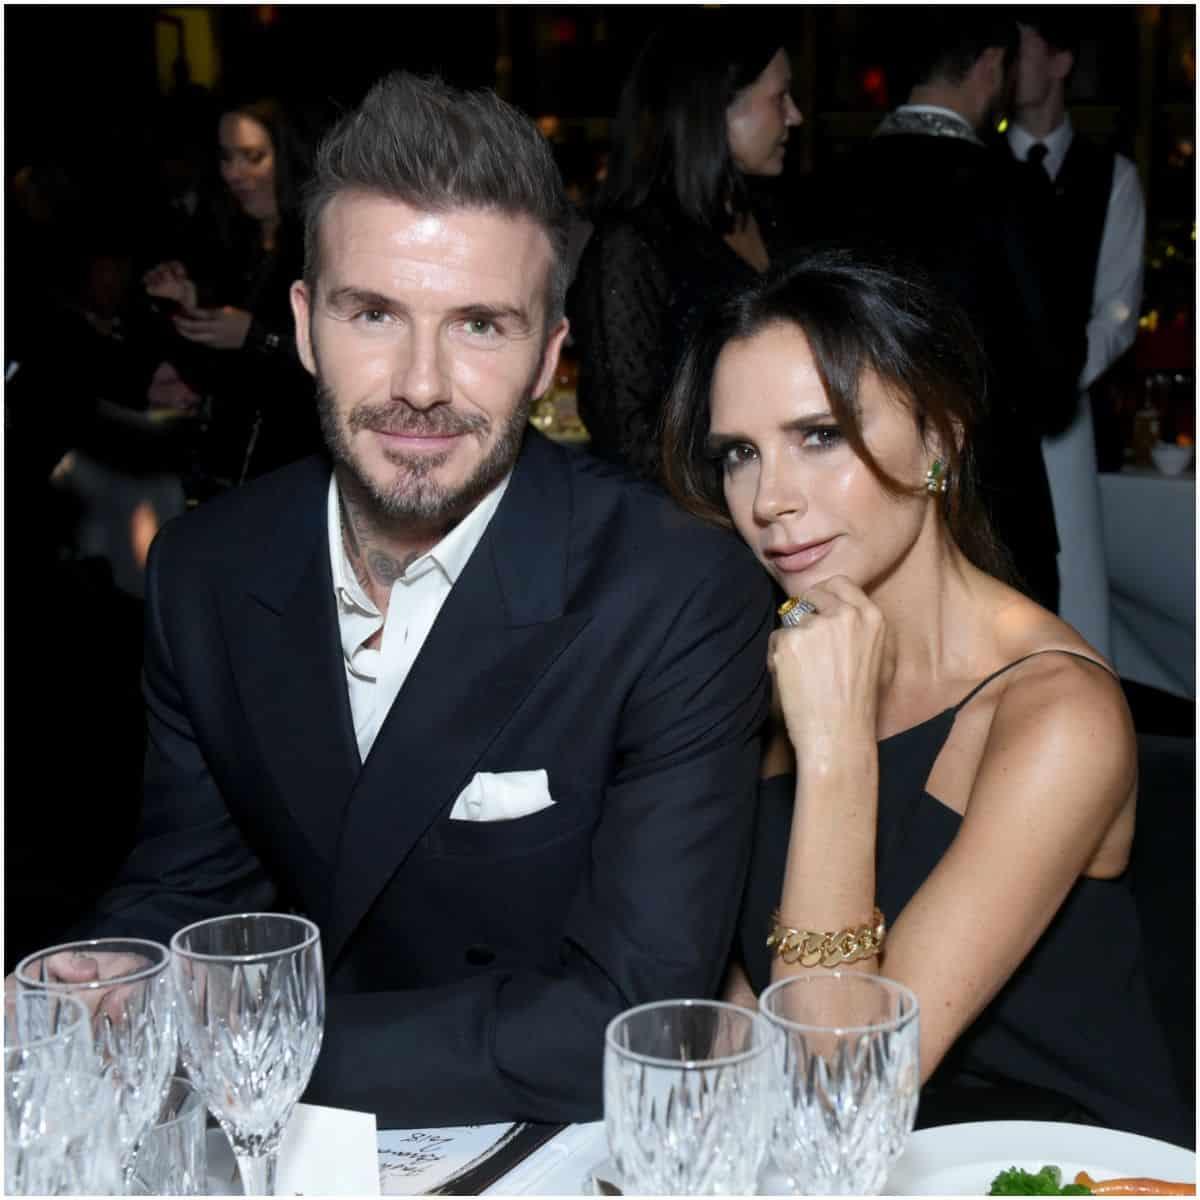 Victoria Beckham and husband David